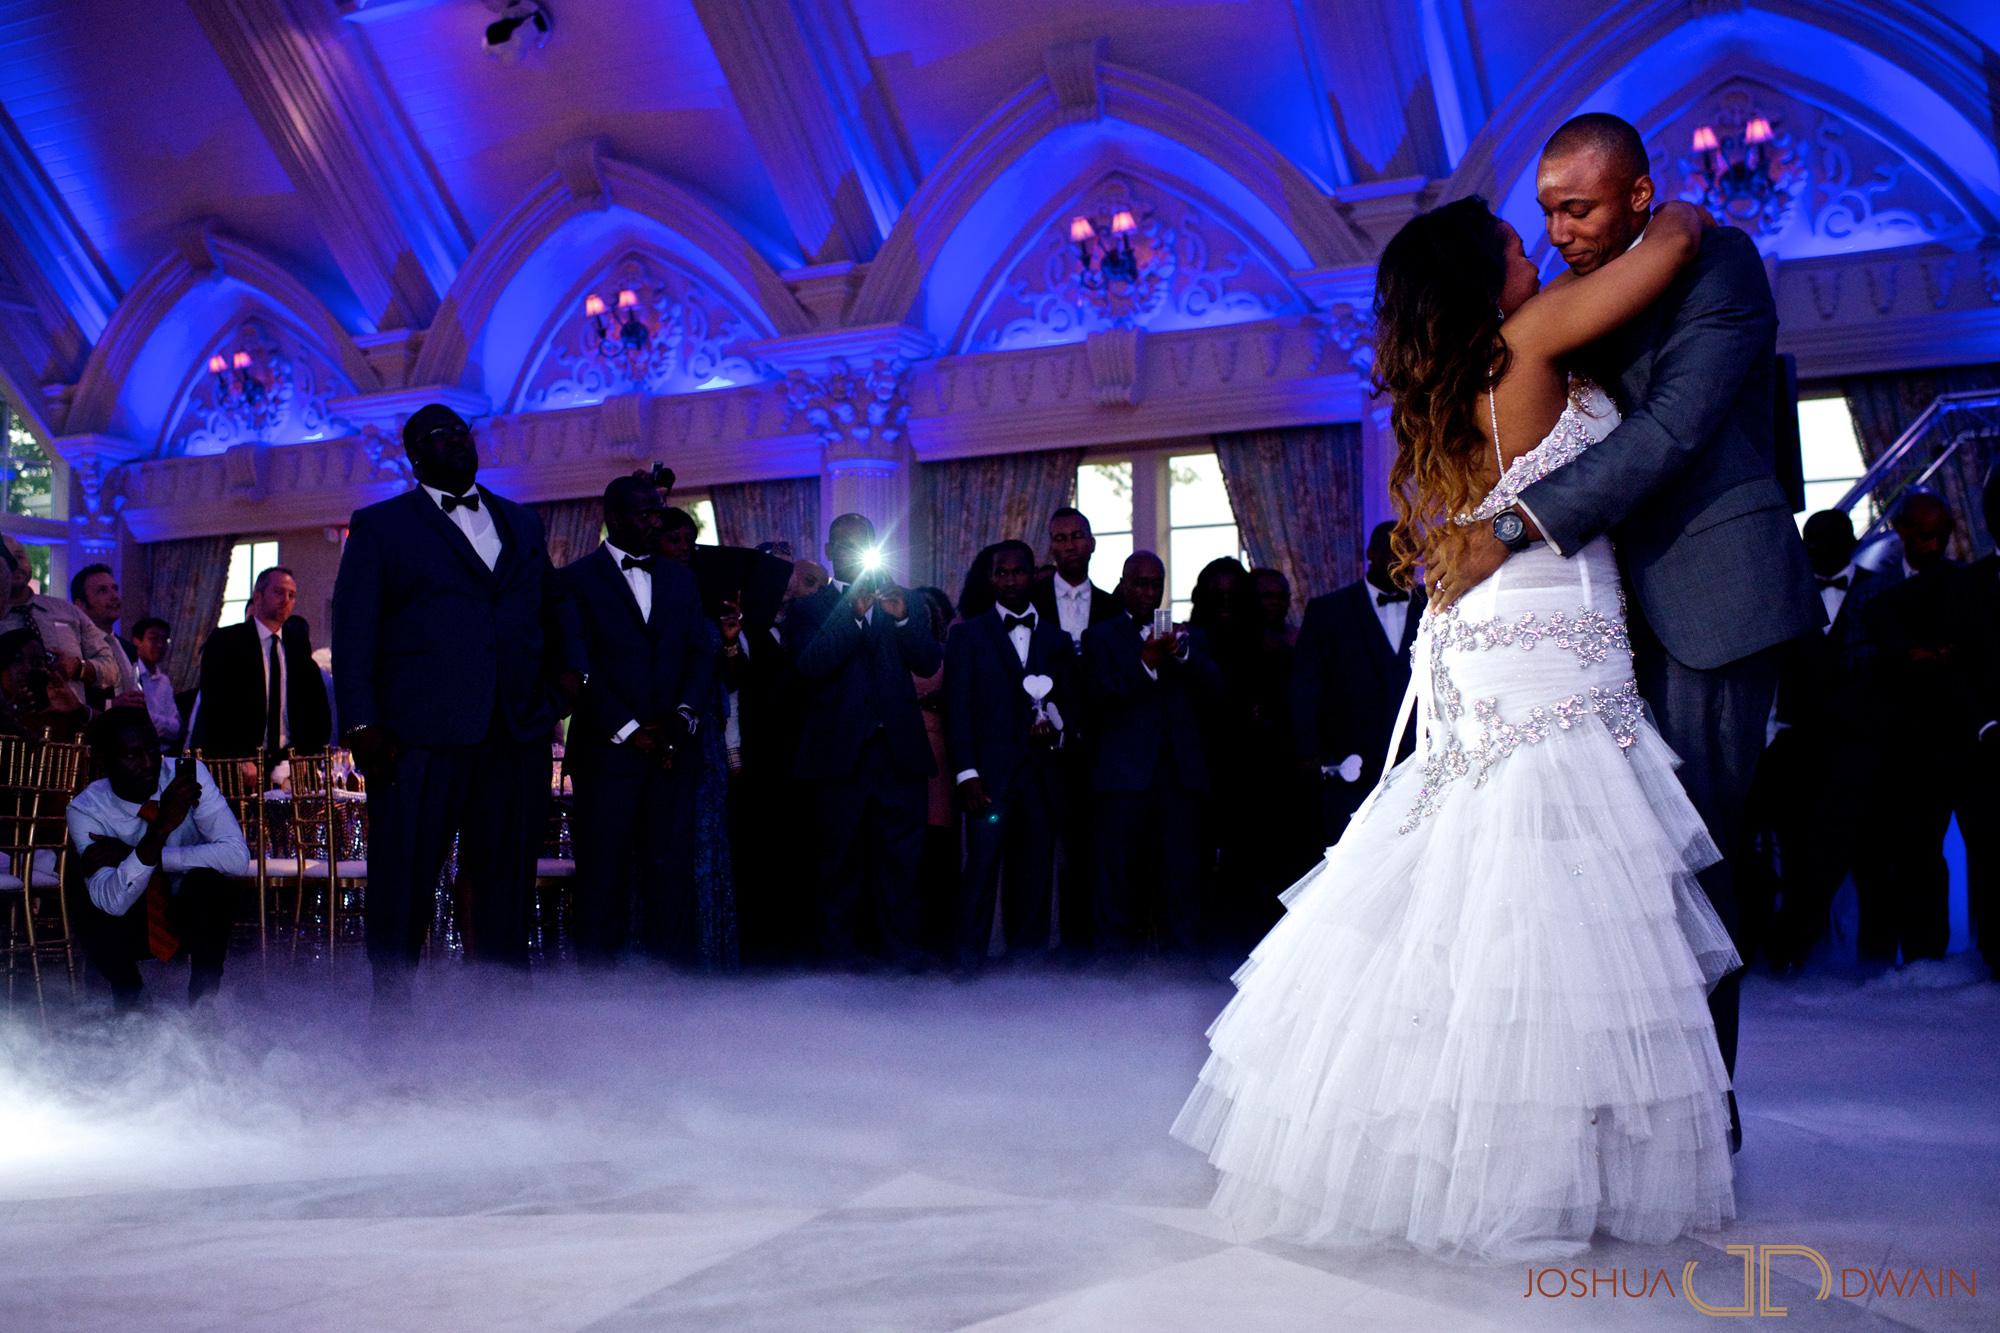 cadisha-antoine-013-ashford-estates-allentown-nj-wedding-photographer-joshua-dwain-photography-